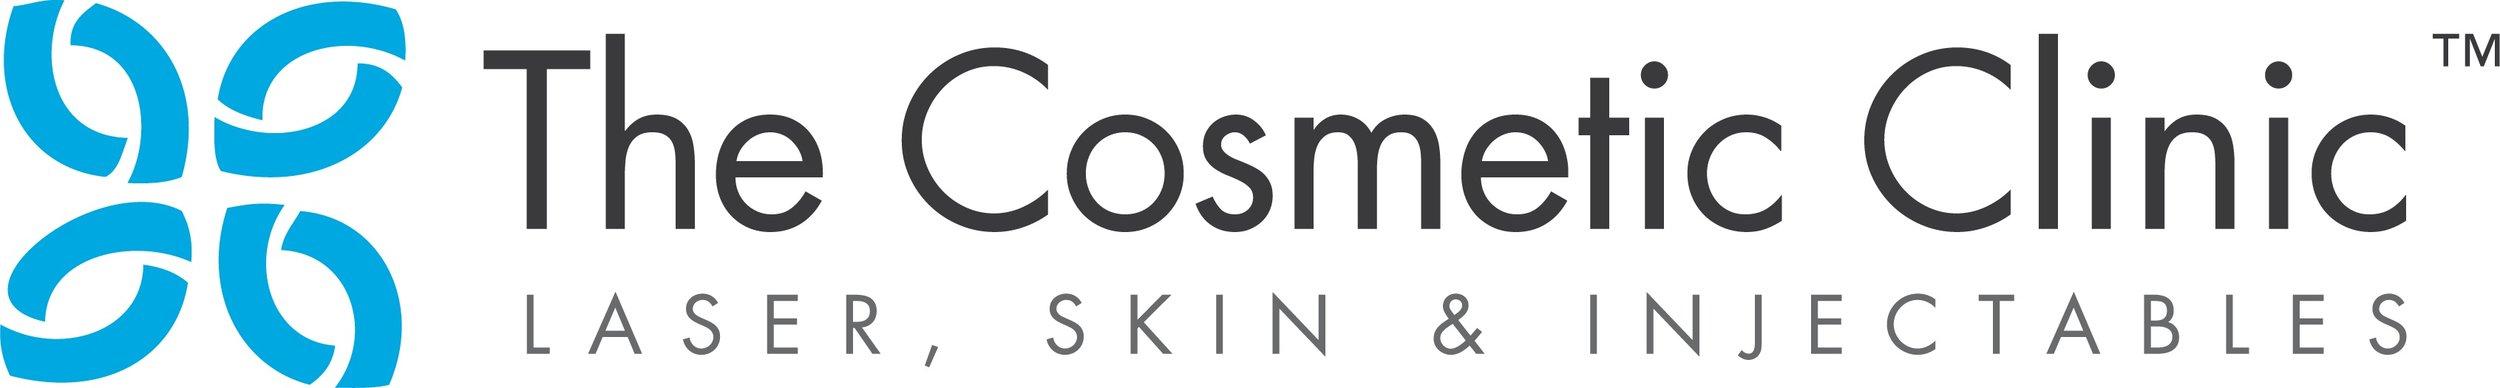 The Cosmetic Clinic Logo_30 Nov 18bhnjmbhnm.jpg